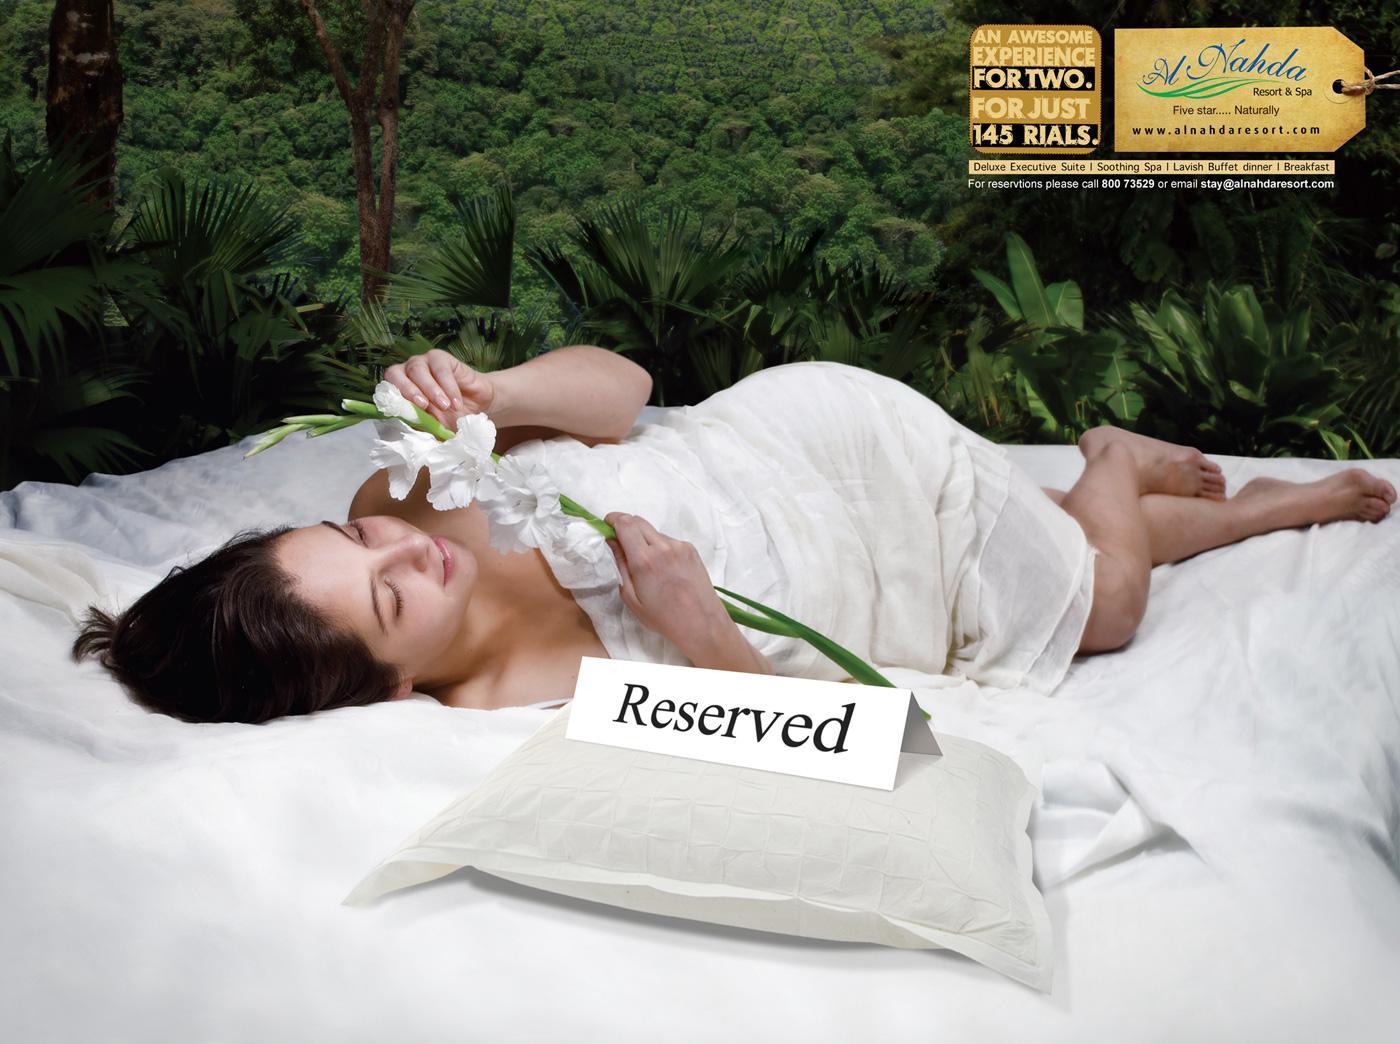 Al Nahda Resort & Spa Print Ad -  Bed